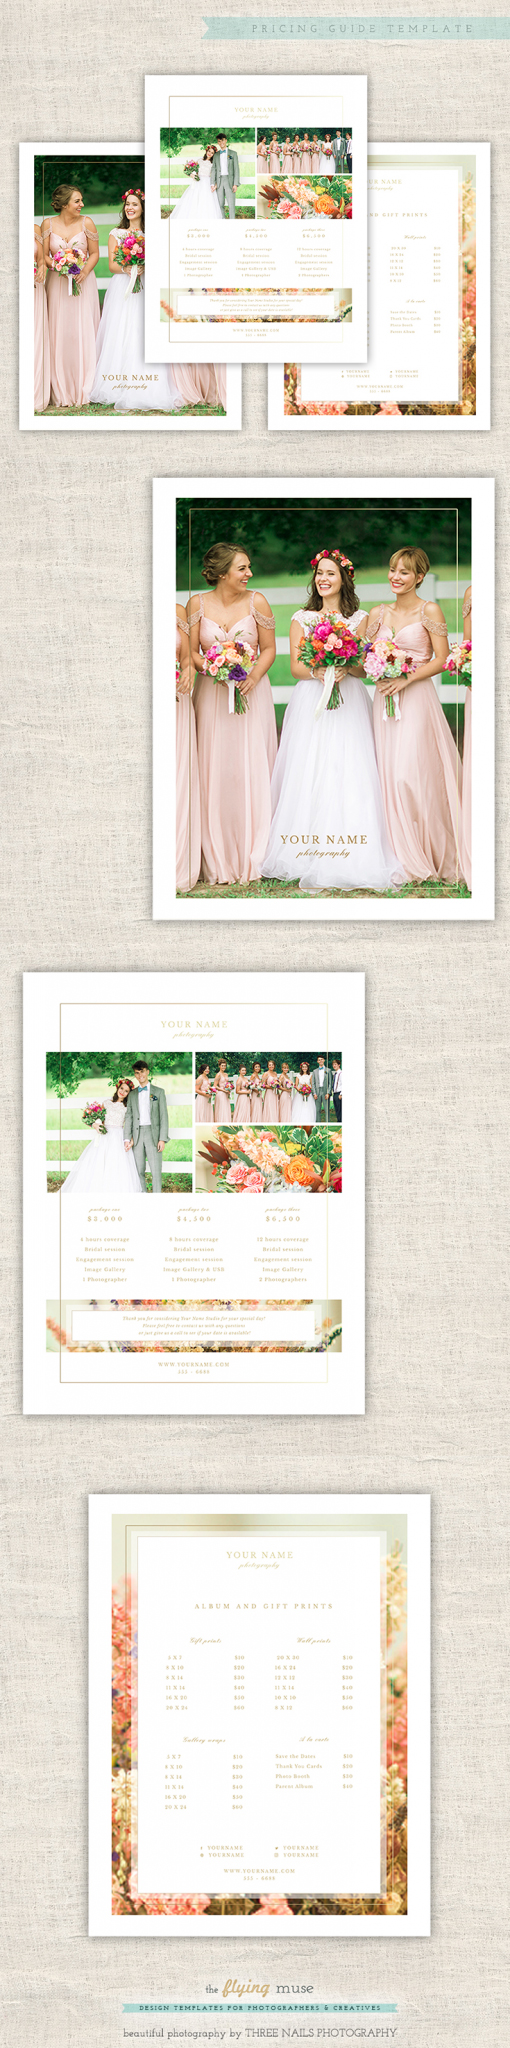 Product Description Wedding Pricing Guide Template Design